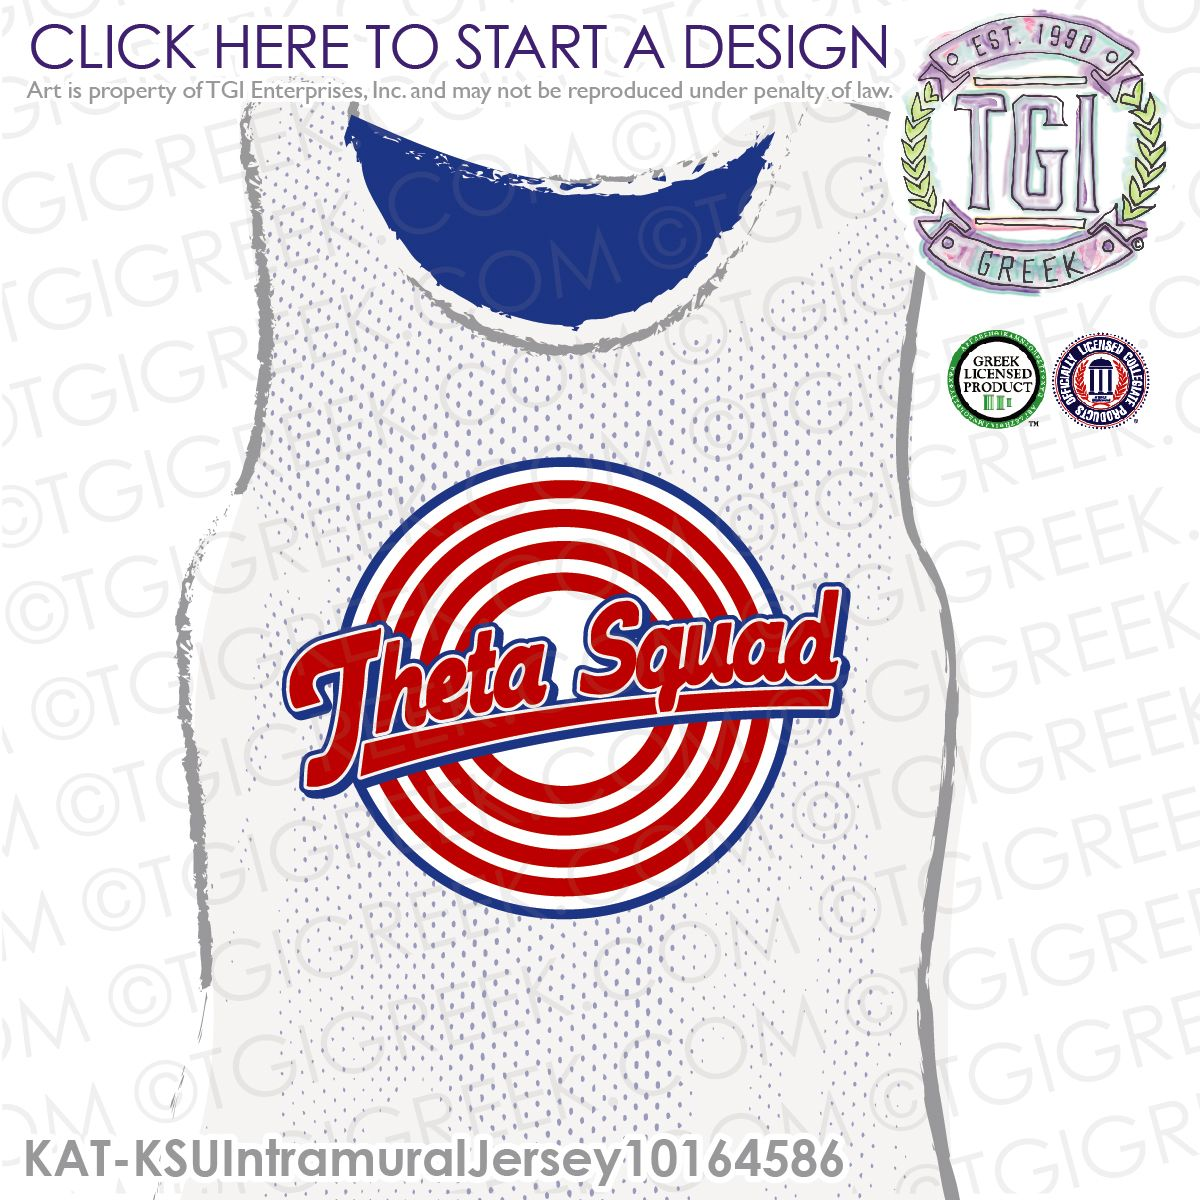 Kappa Alpha Theta | Theta | ΚΑΘ | Intramural | Athletics | Sisterhood | Intramural Tee | Intramural Jersey | TGI Greek | Greek Apparel | Custom Apparel | Sorority Tee Shirts| Sorority Tanks | Sorority T-shirts